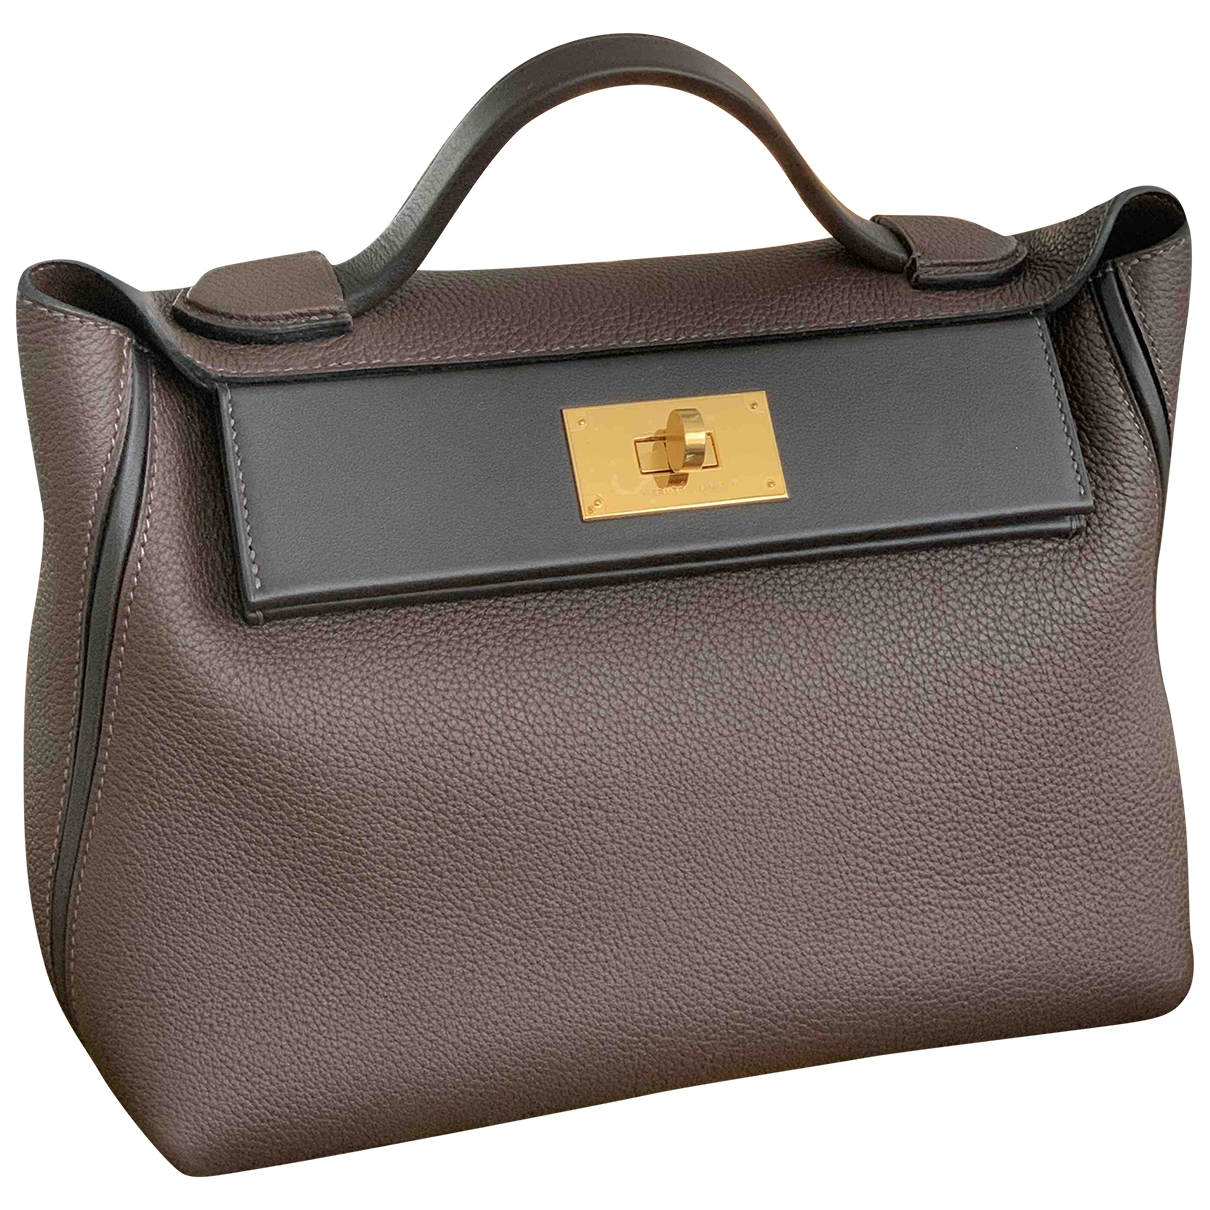 Hermes 24/24 Handtasche in  Braun Leder